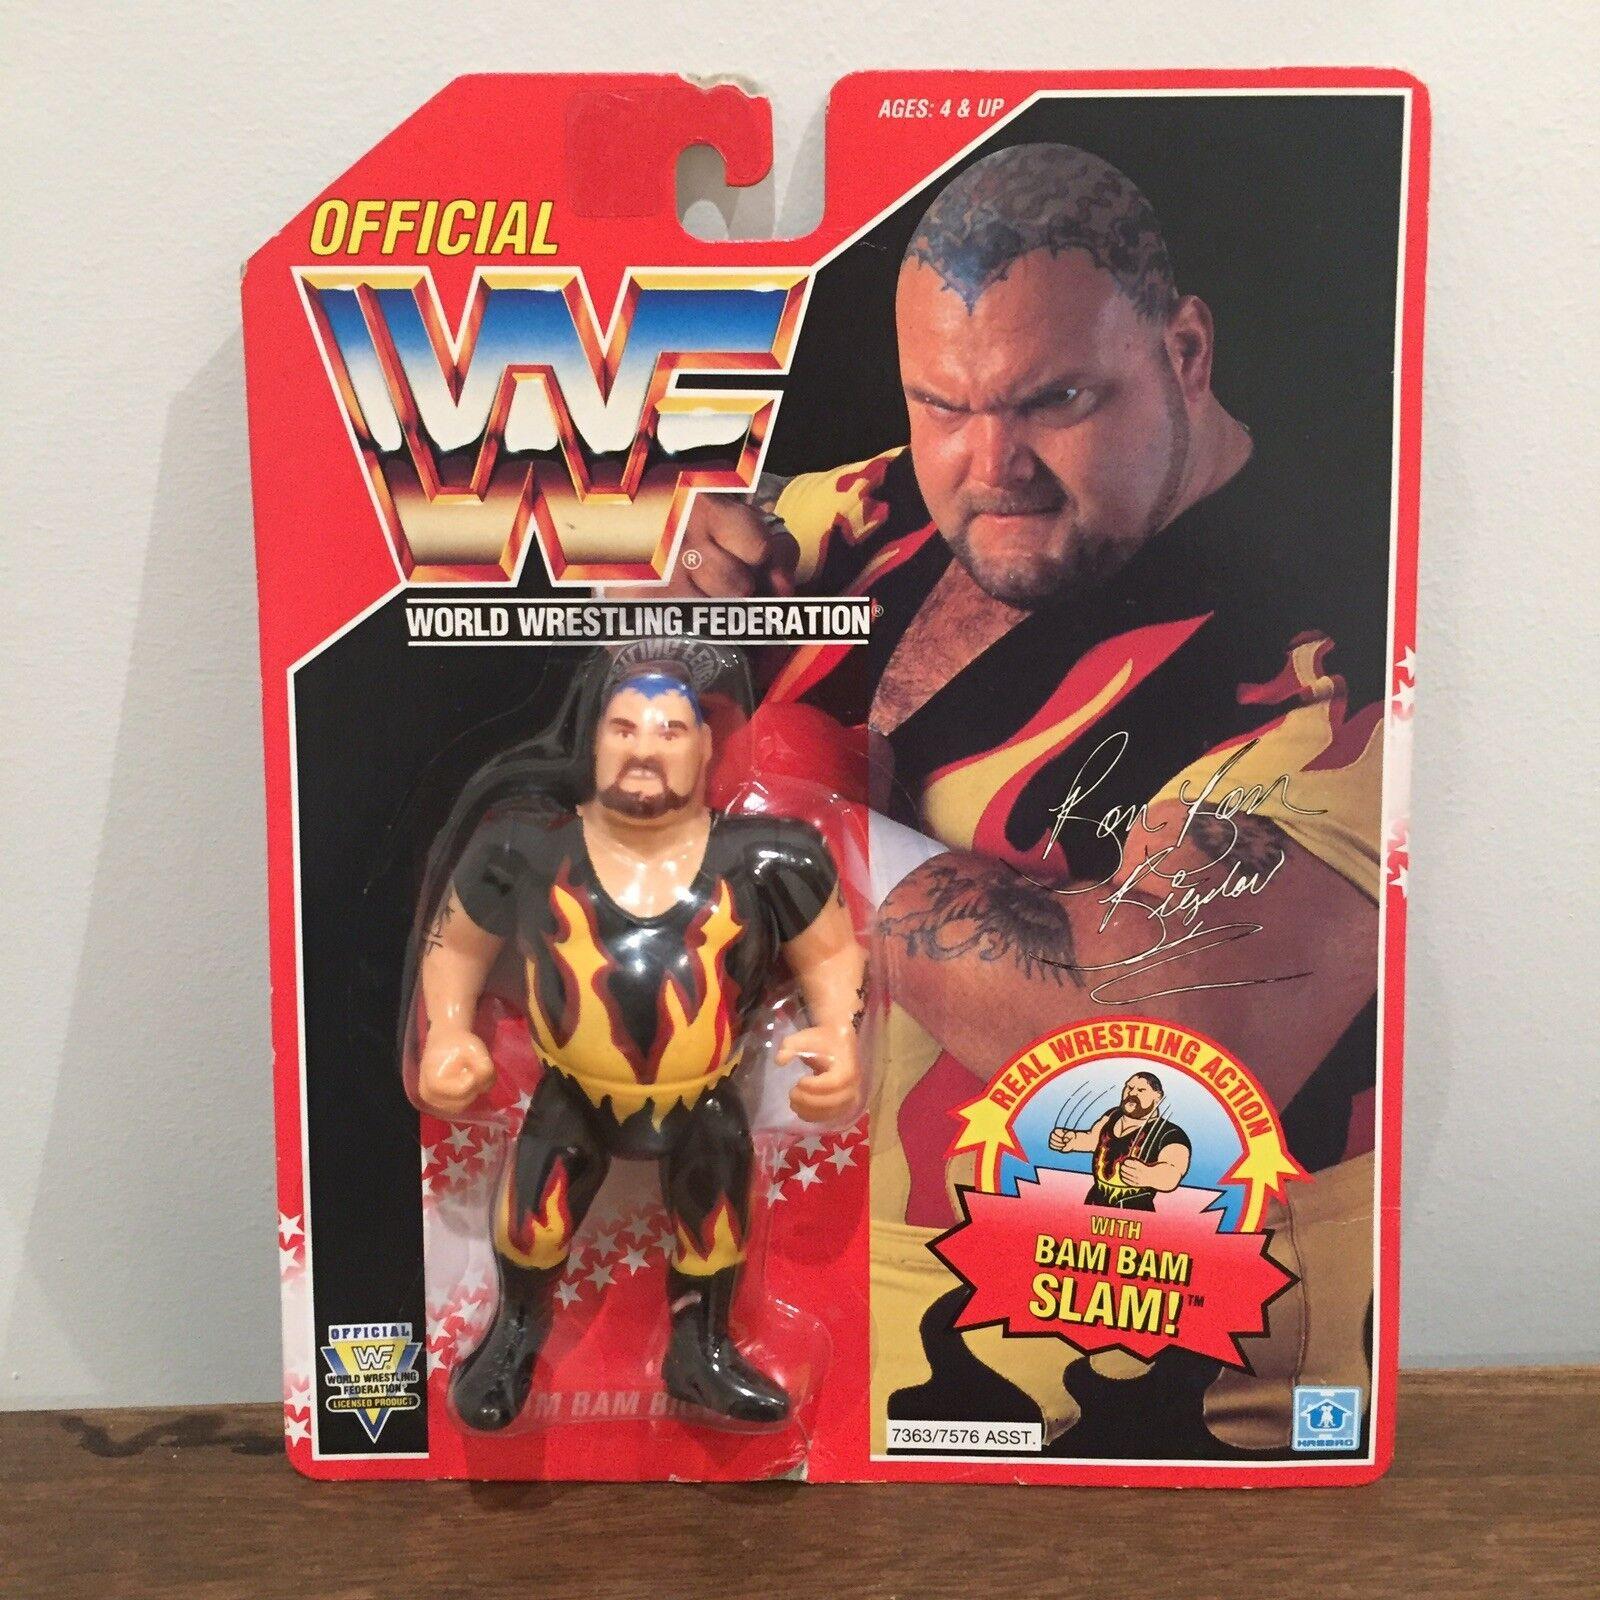 WWF WWE Bam Bam Bigelow Vintage Hasbro Action Figure 1994 Series 8 MOC